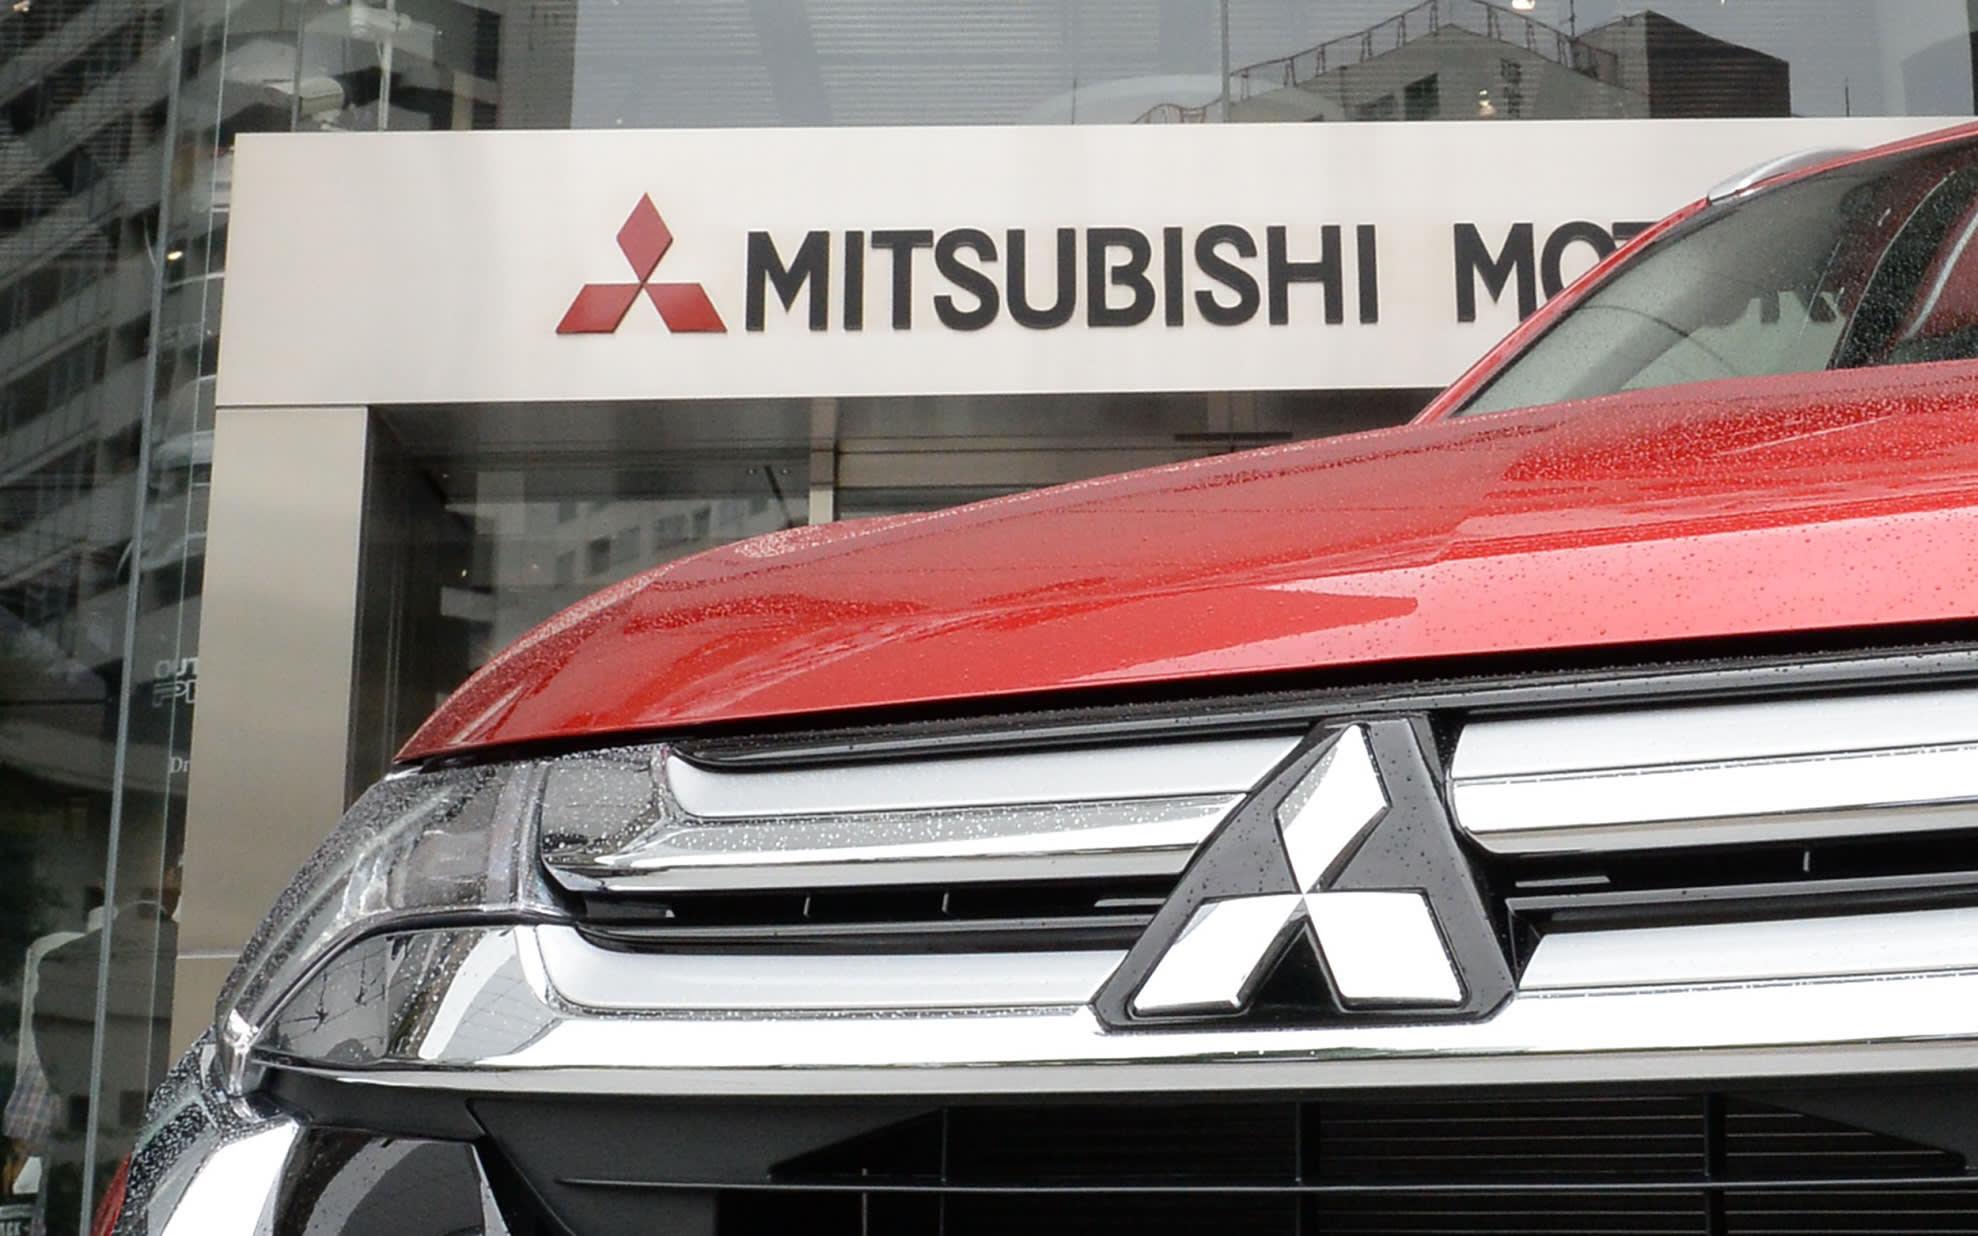 Mitsubishi Motors Latest Models >> 8 Mitsubishi Motors Models Fail To Meet Stated Fuel Economy Levels